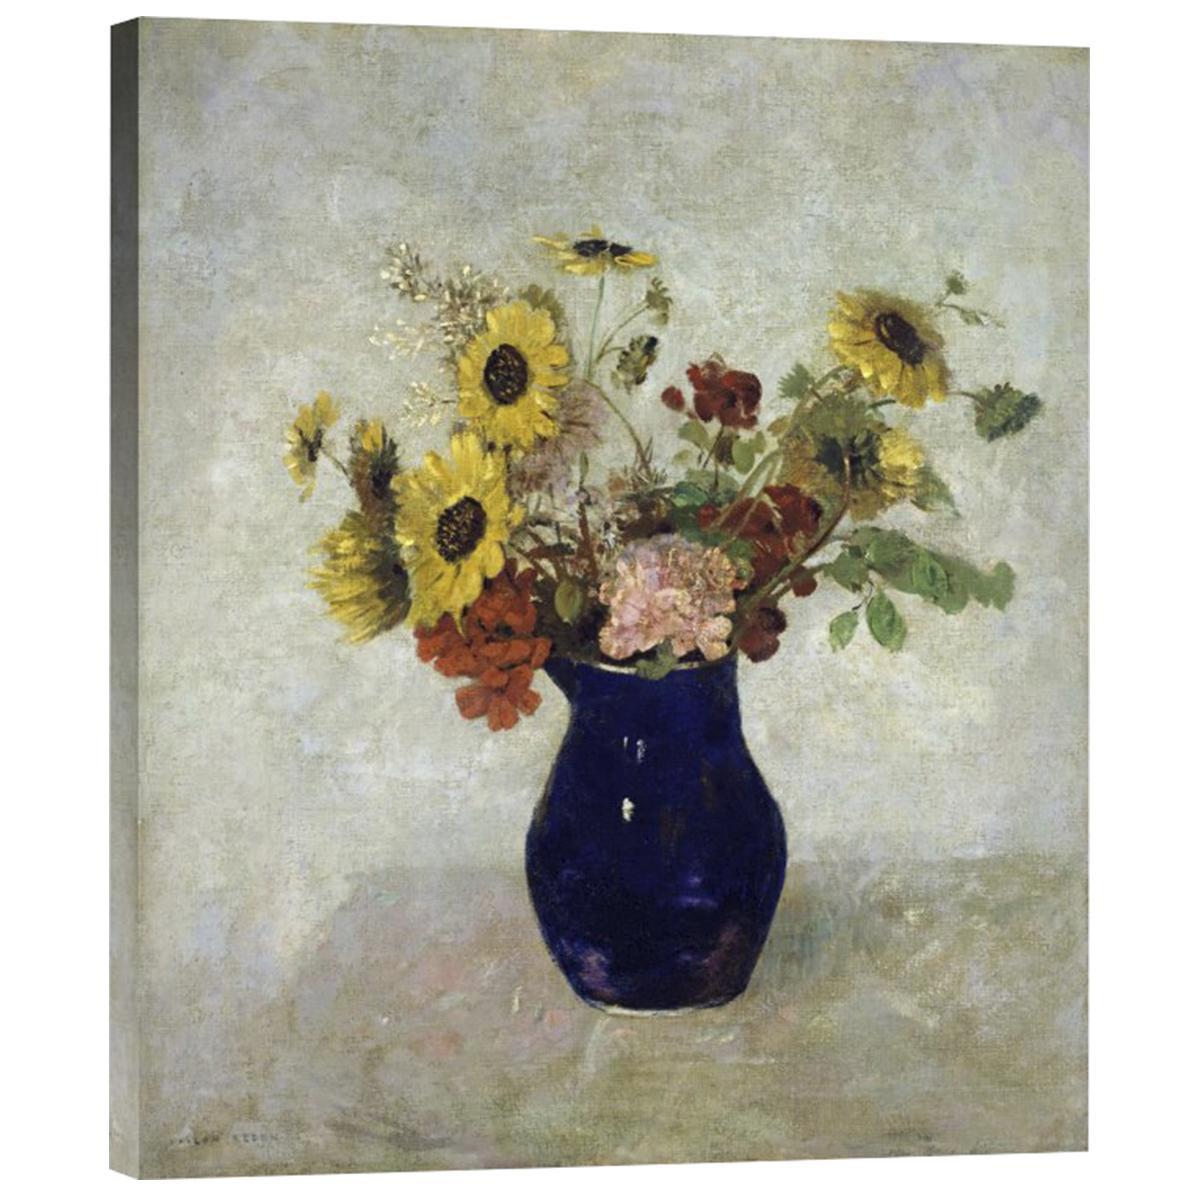 odilon redon vase of flowers of global gallery 22 x 19 vase de fleurs by odilon redon nebraska with regard to 22 x 19 vase de fleurs by odilon redon